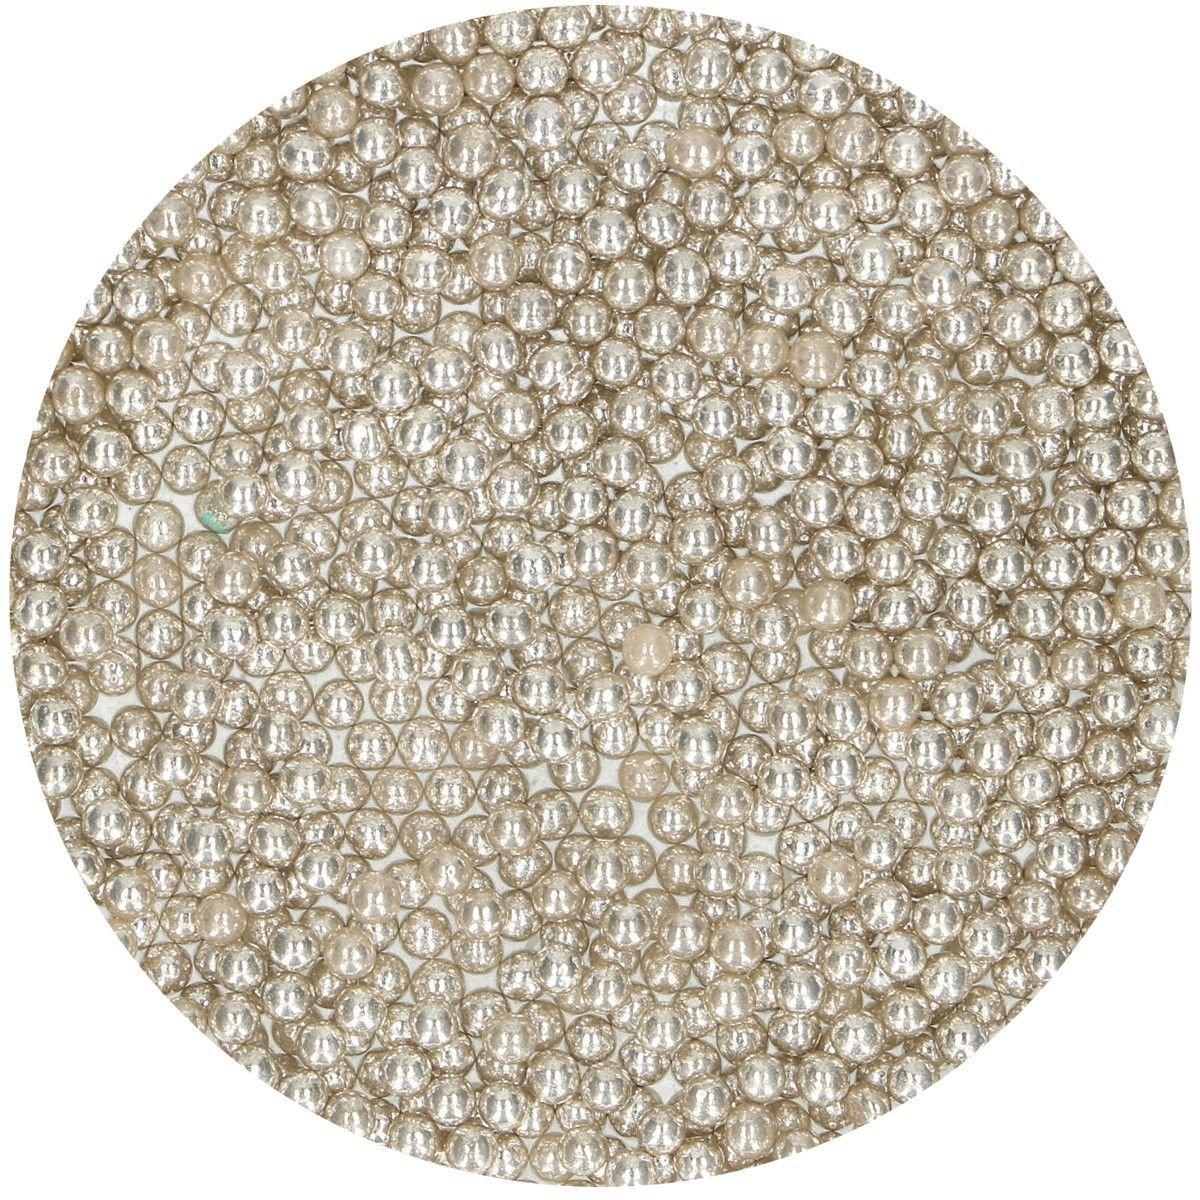 FunCakes Sugarballs -4mm METALLIC SILVER 80g -Ζαχαρωτά Μπιλίτσες/Πέρλες Μεταλλικό Ασημί